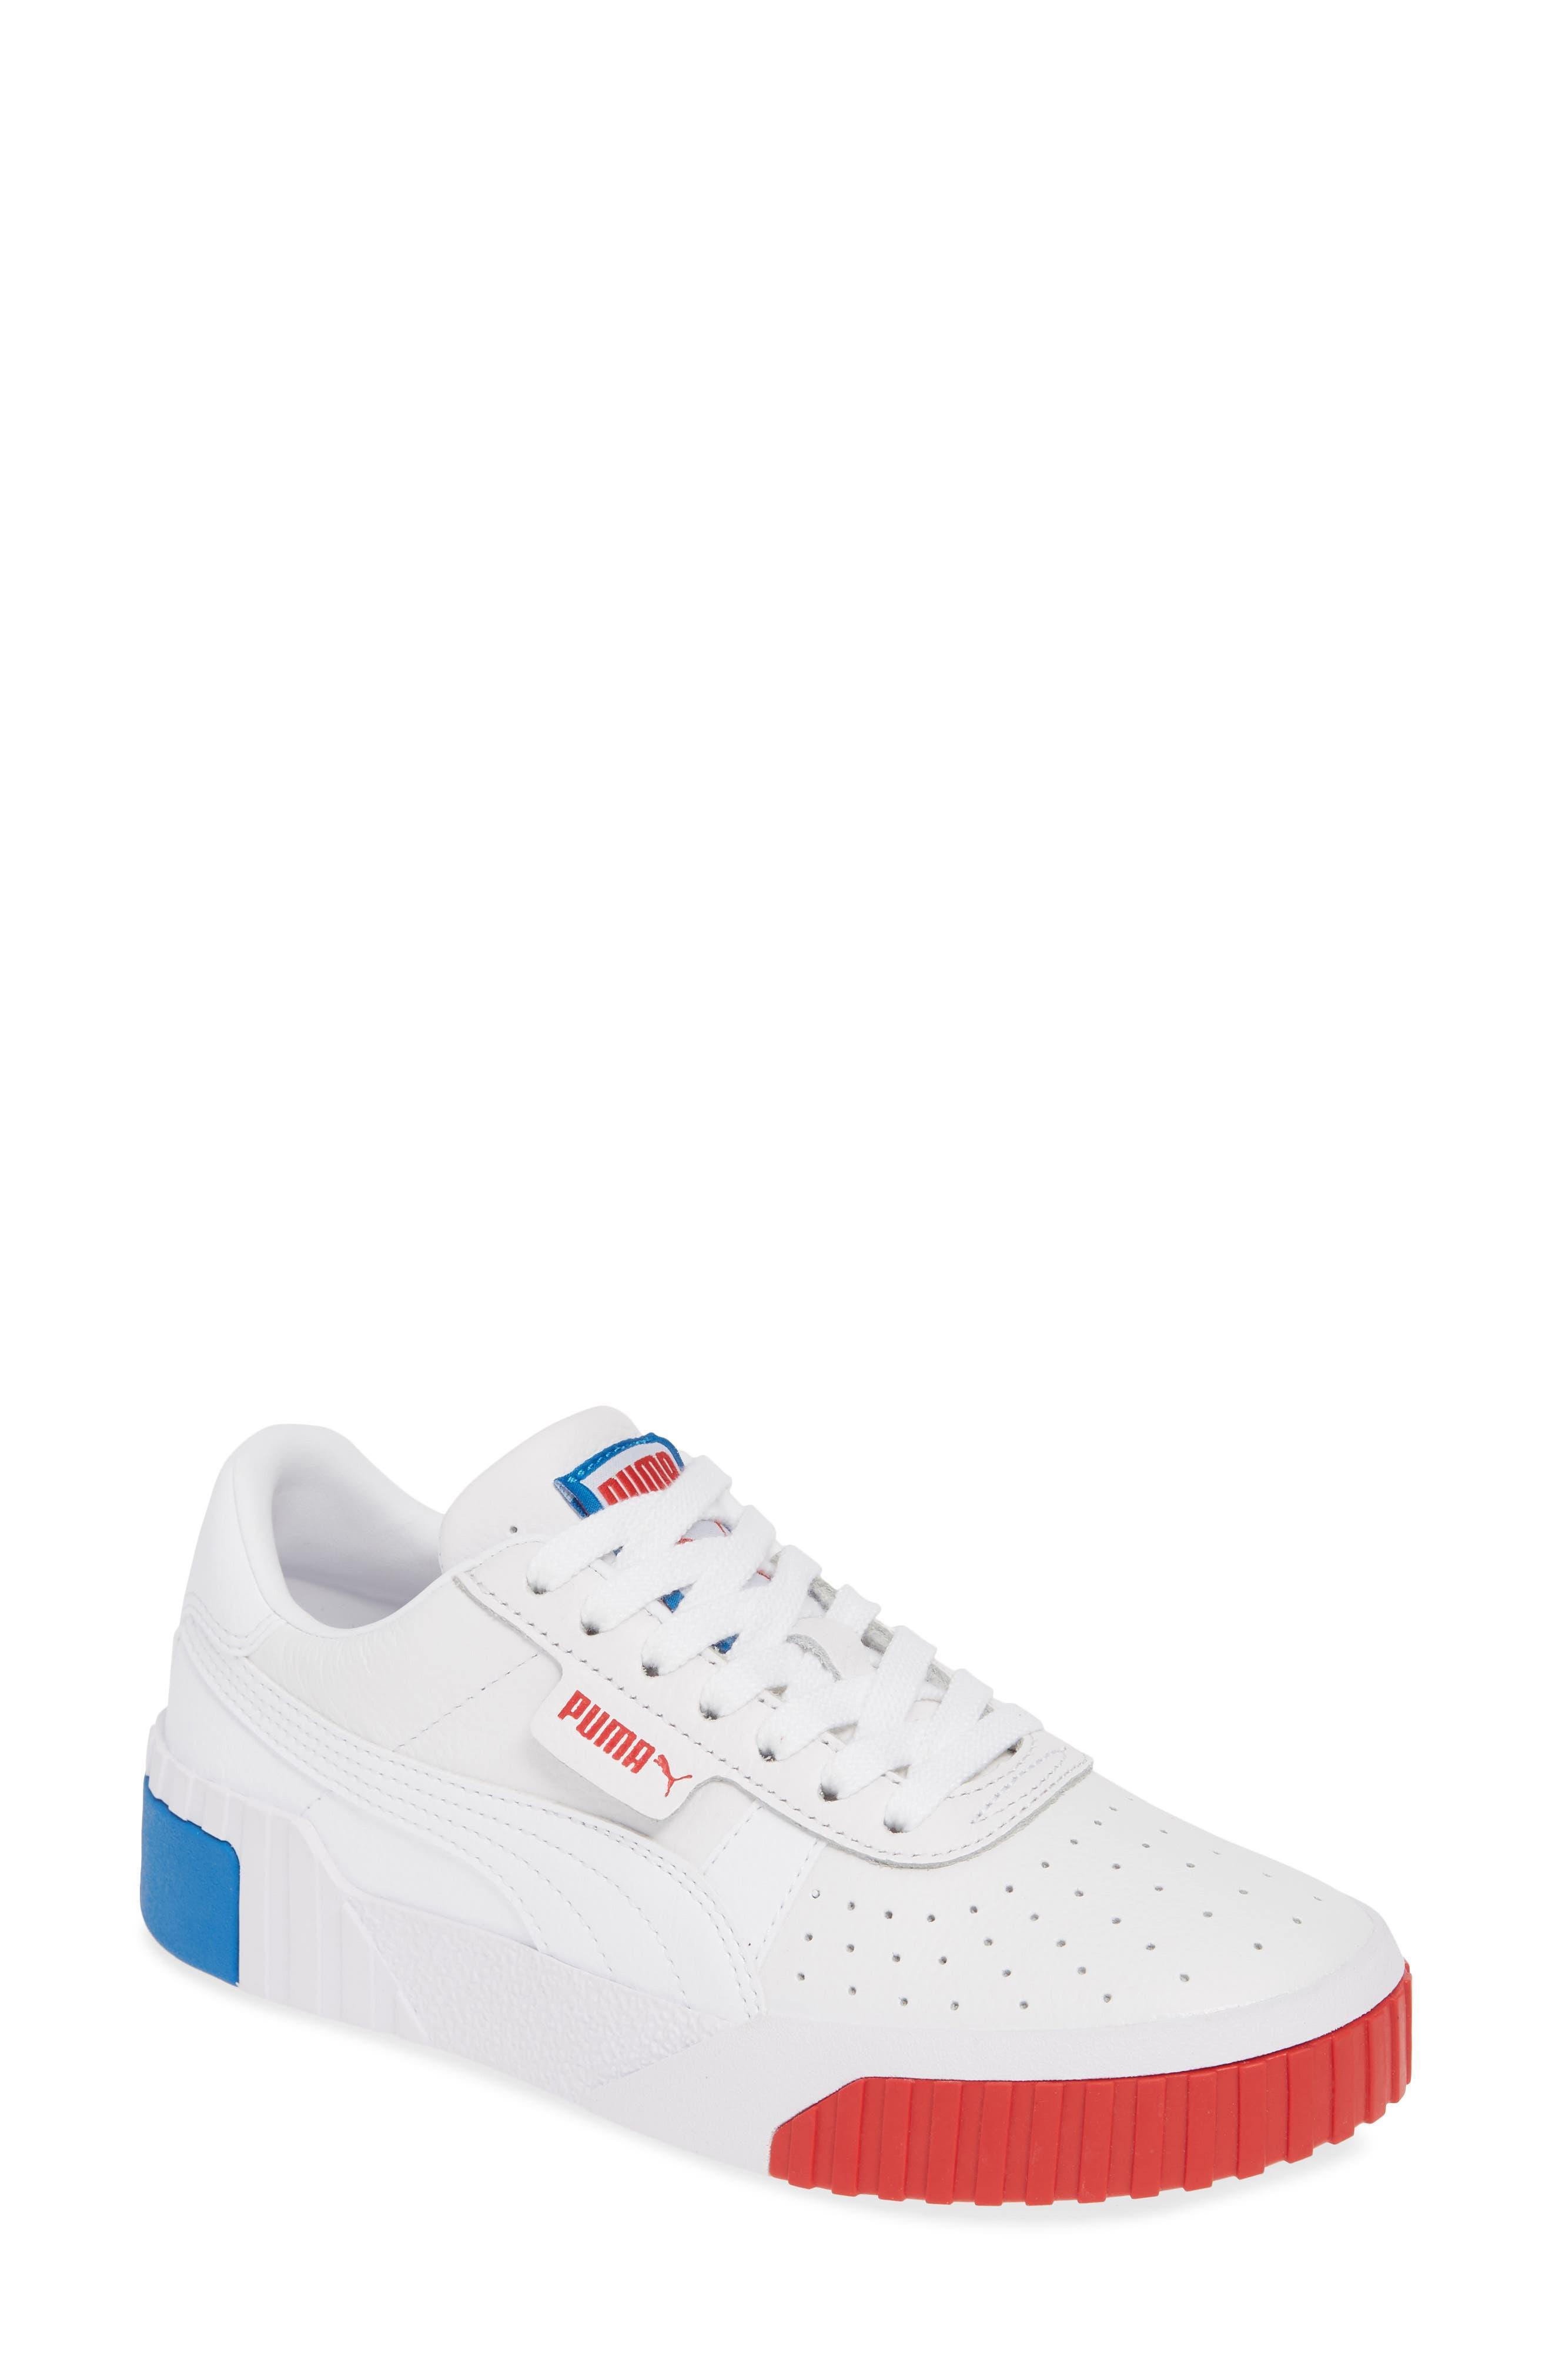 Sports Sneakers: Puma Zumba